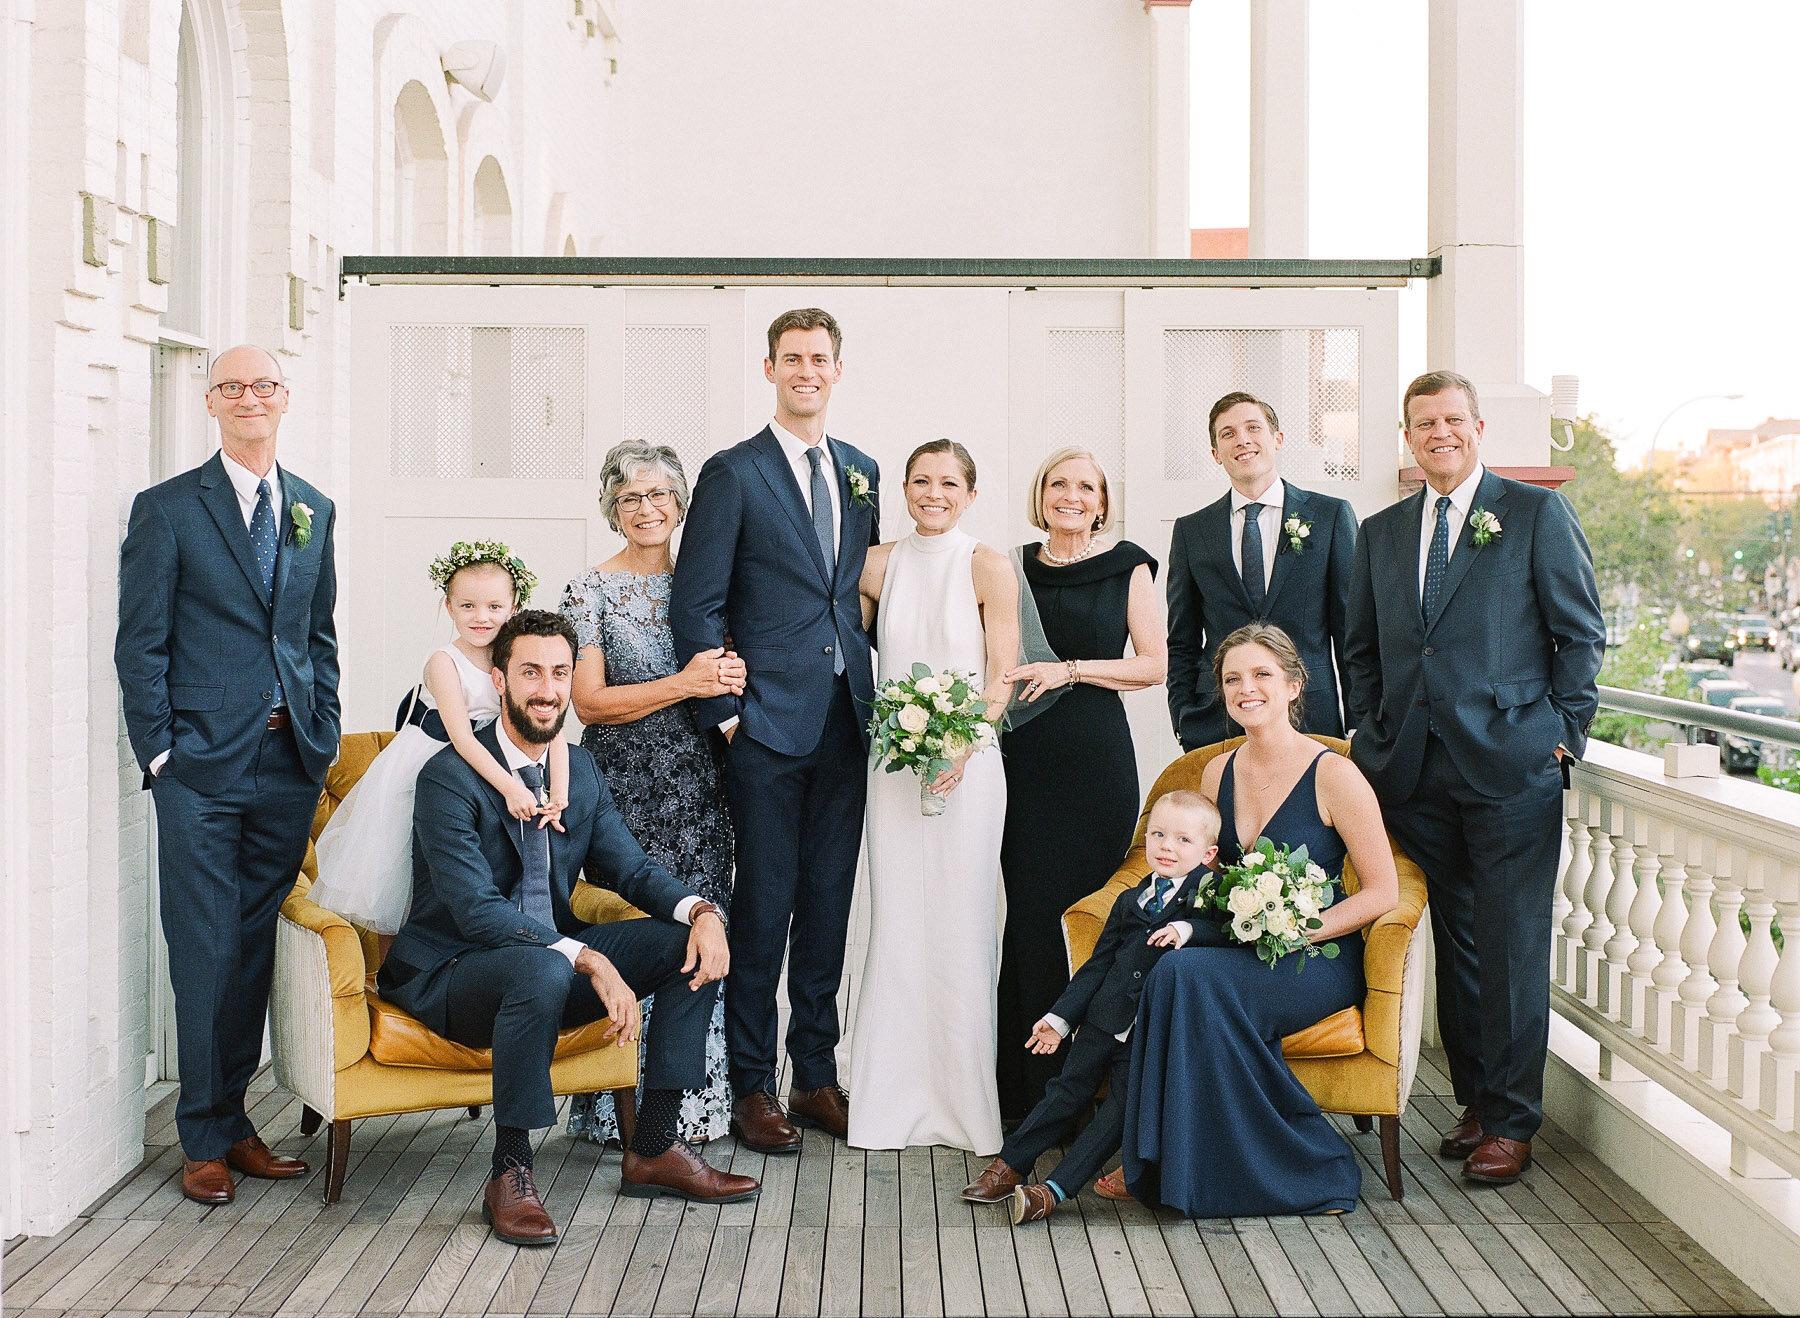 Adelphi Saratoga Wedding by Michelle Lange Photography-38.jpg